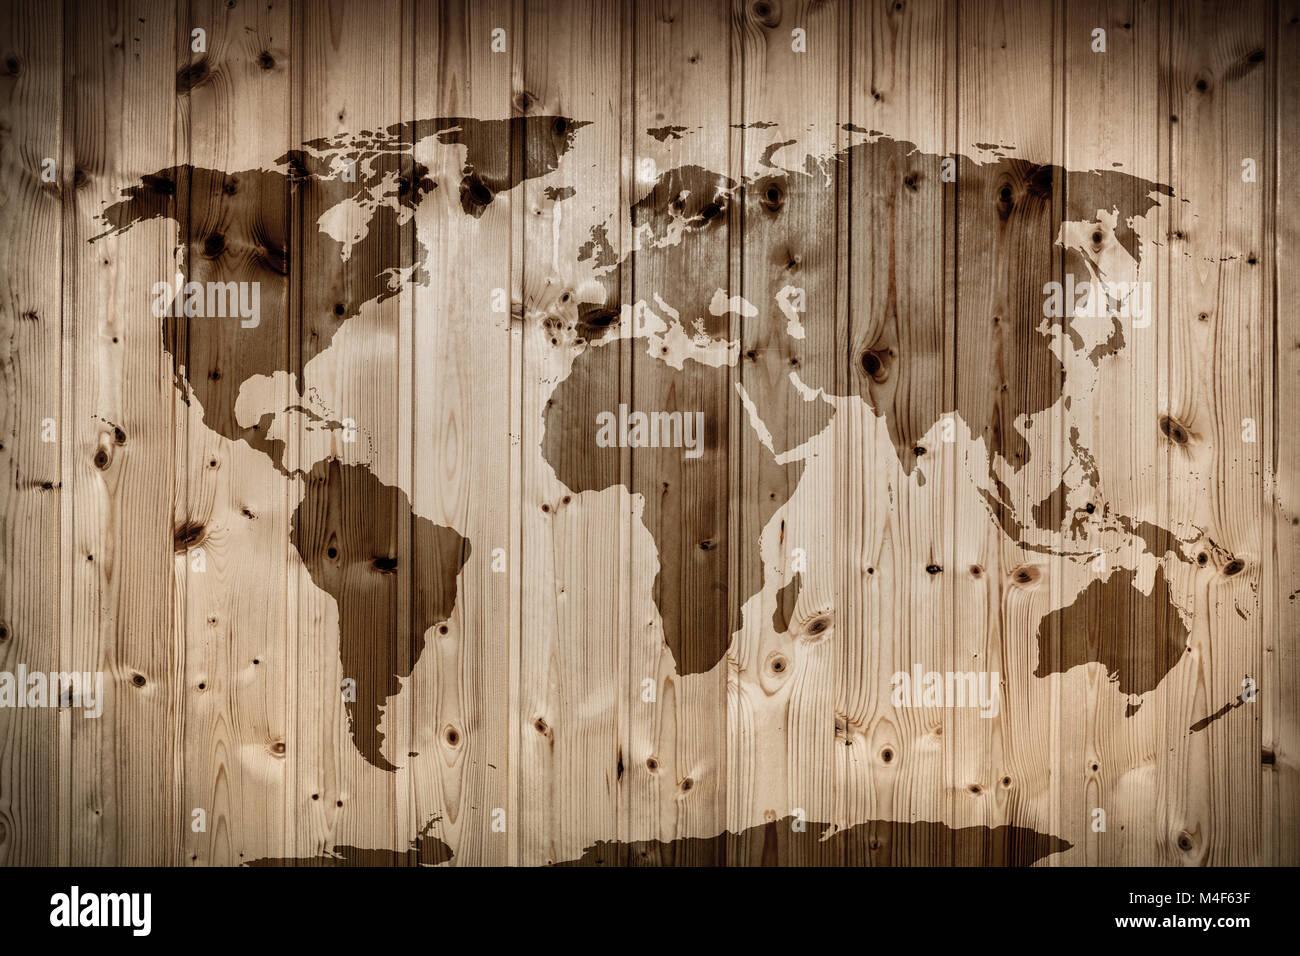 Weltkarte Auf Holz Wand Vintage Stockfoto Bild 174896387 Alamy